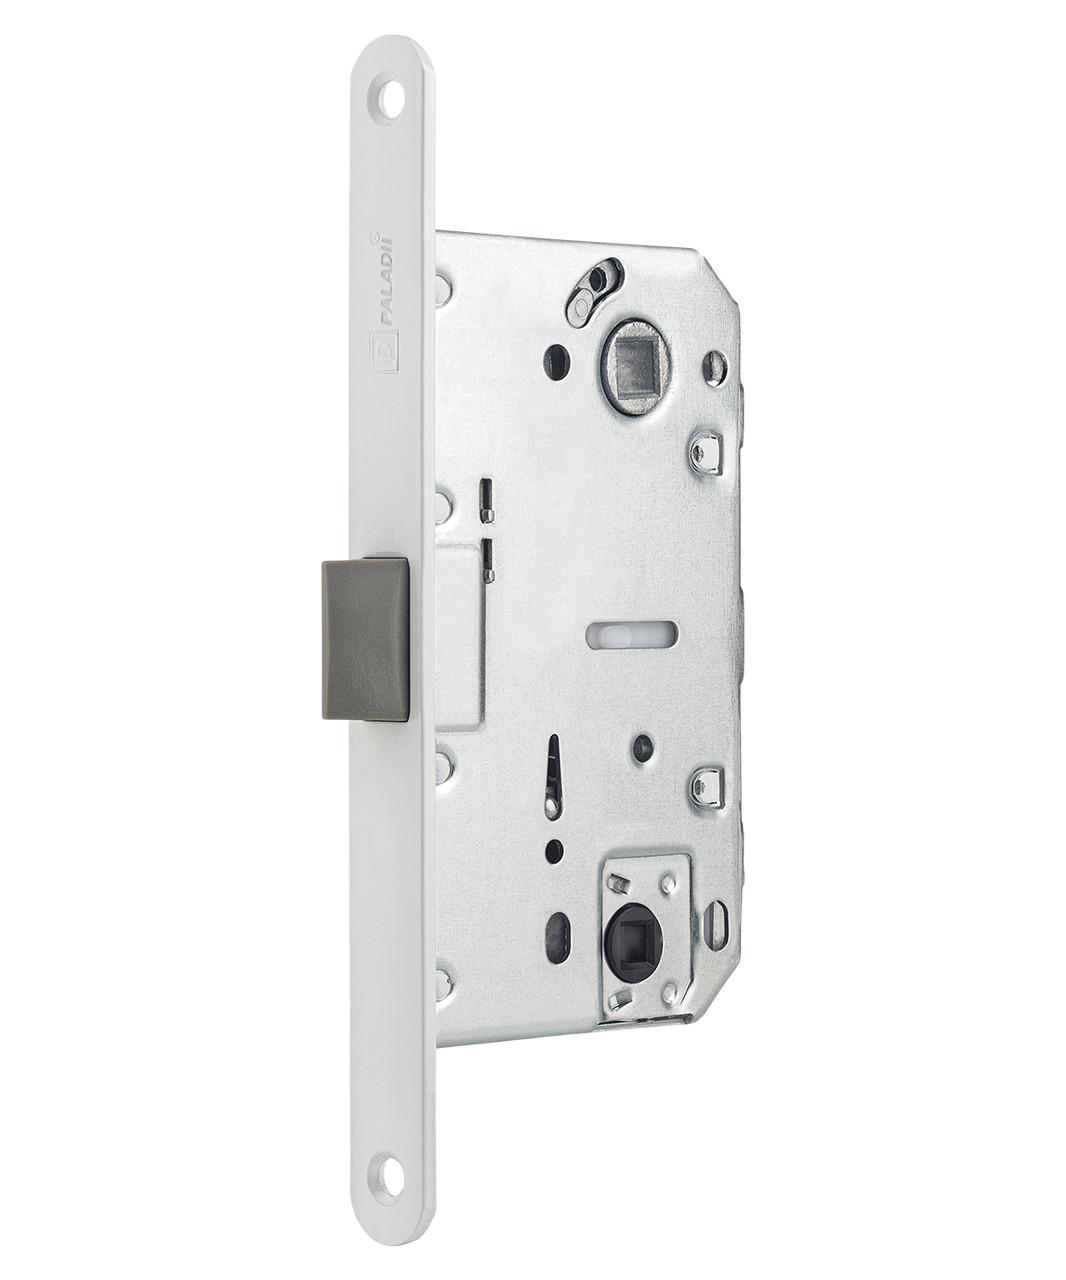 Механизм межкомнатный Paladii 96*50*18мм WC 410B PVC Kevlar PW белый